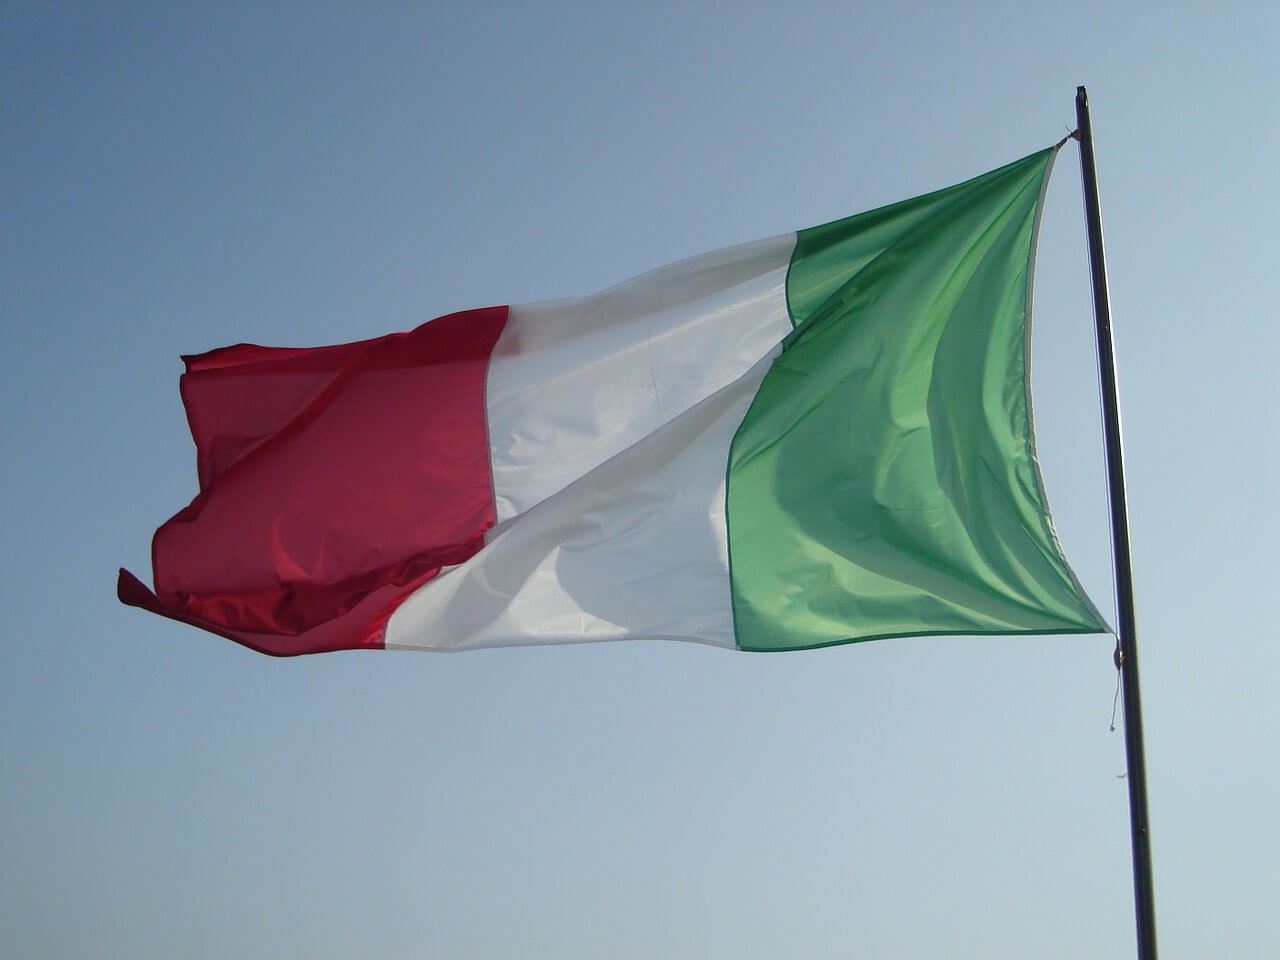 25 aprile - Bandiera italiana